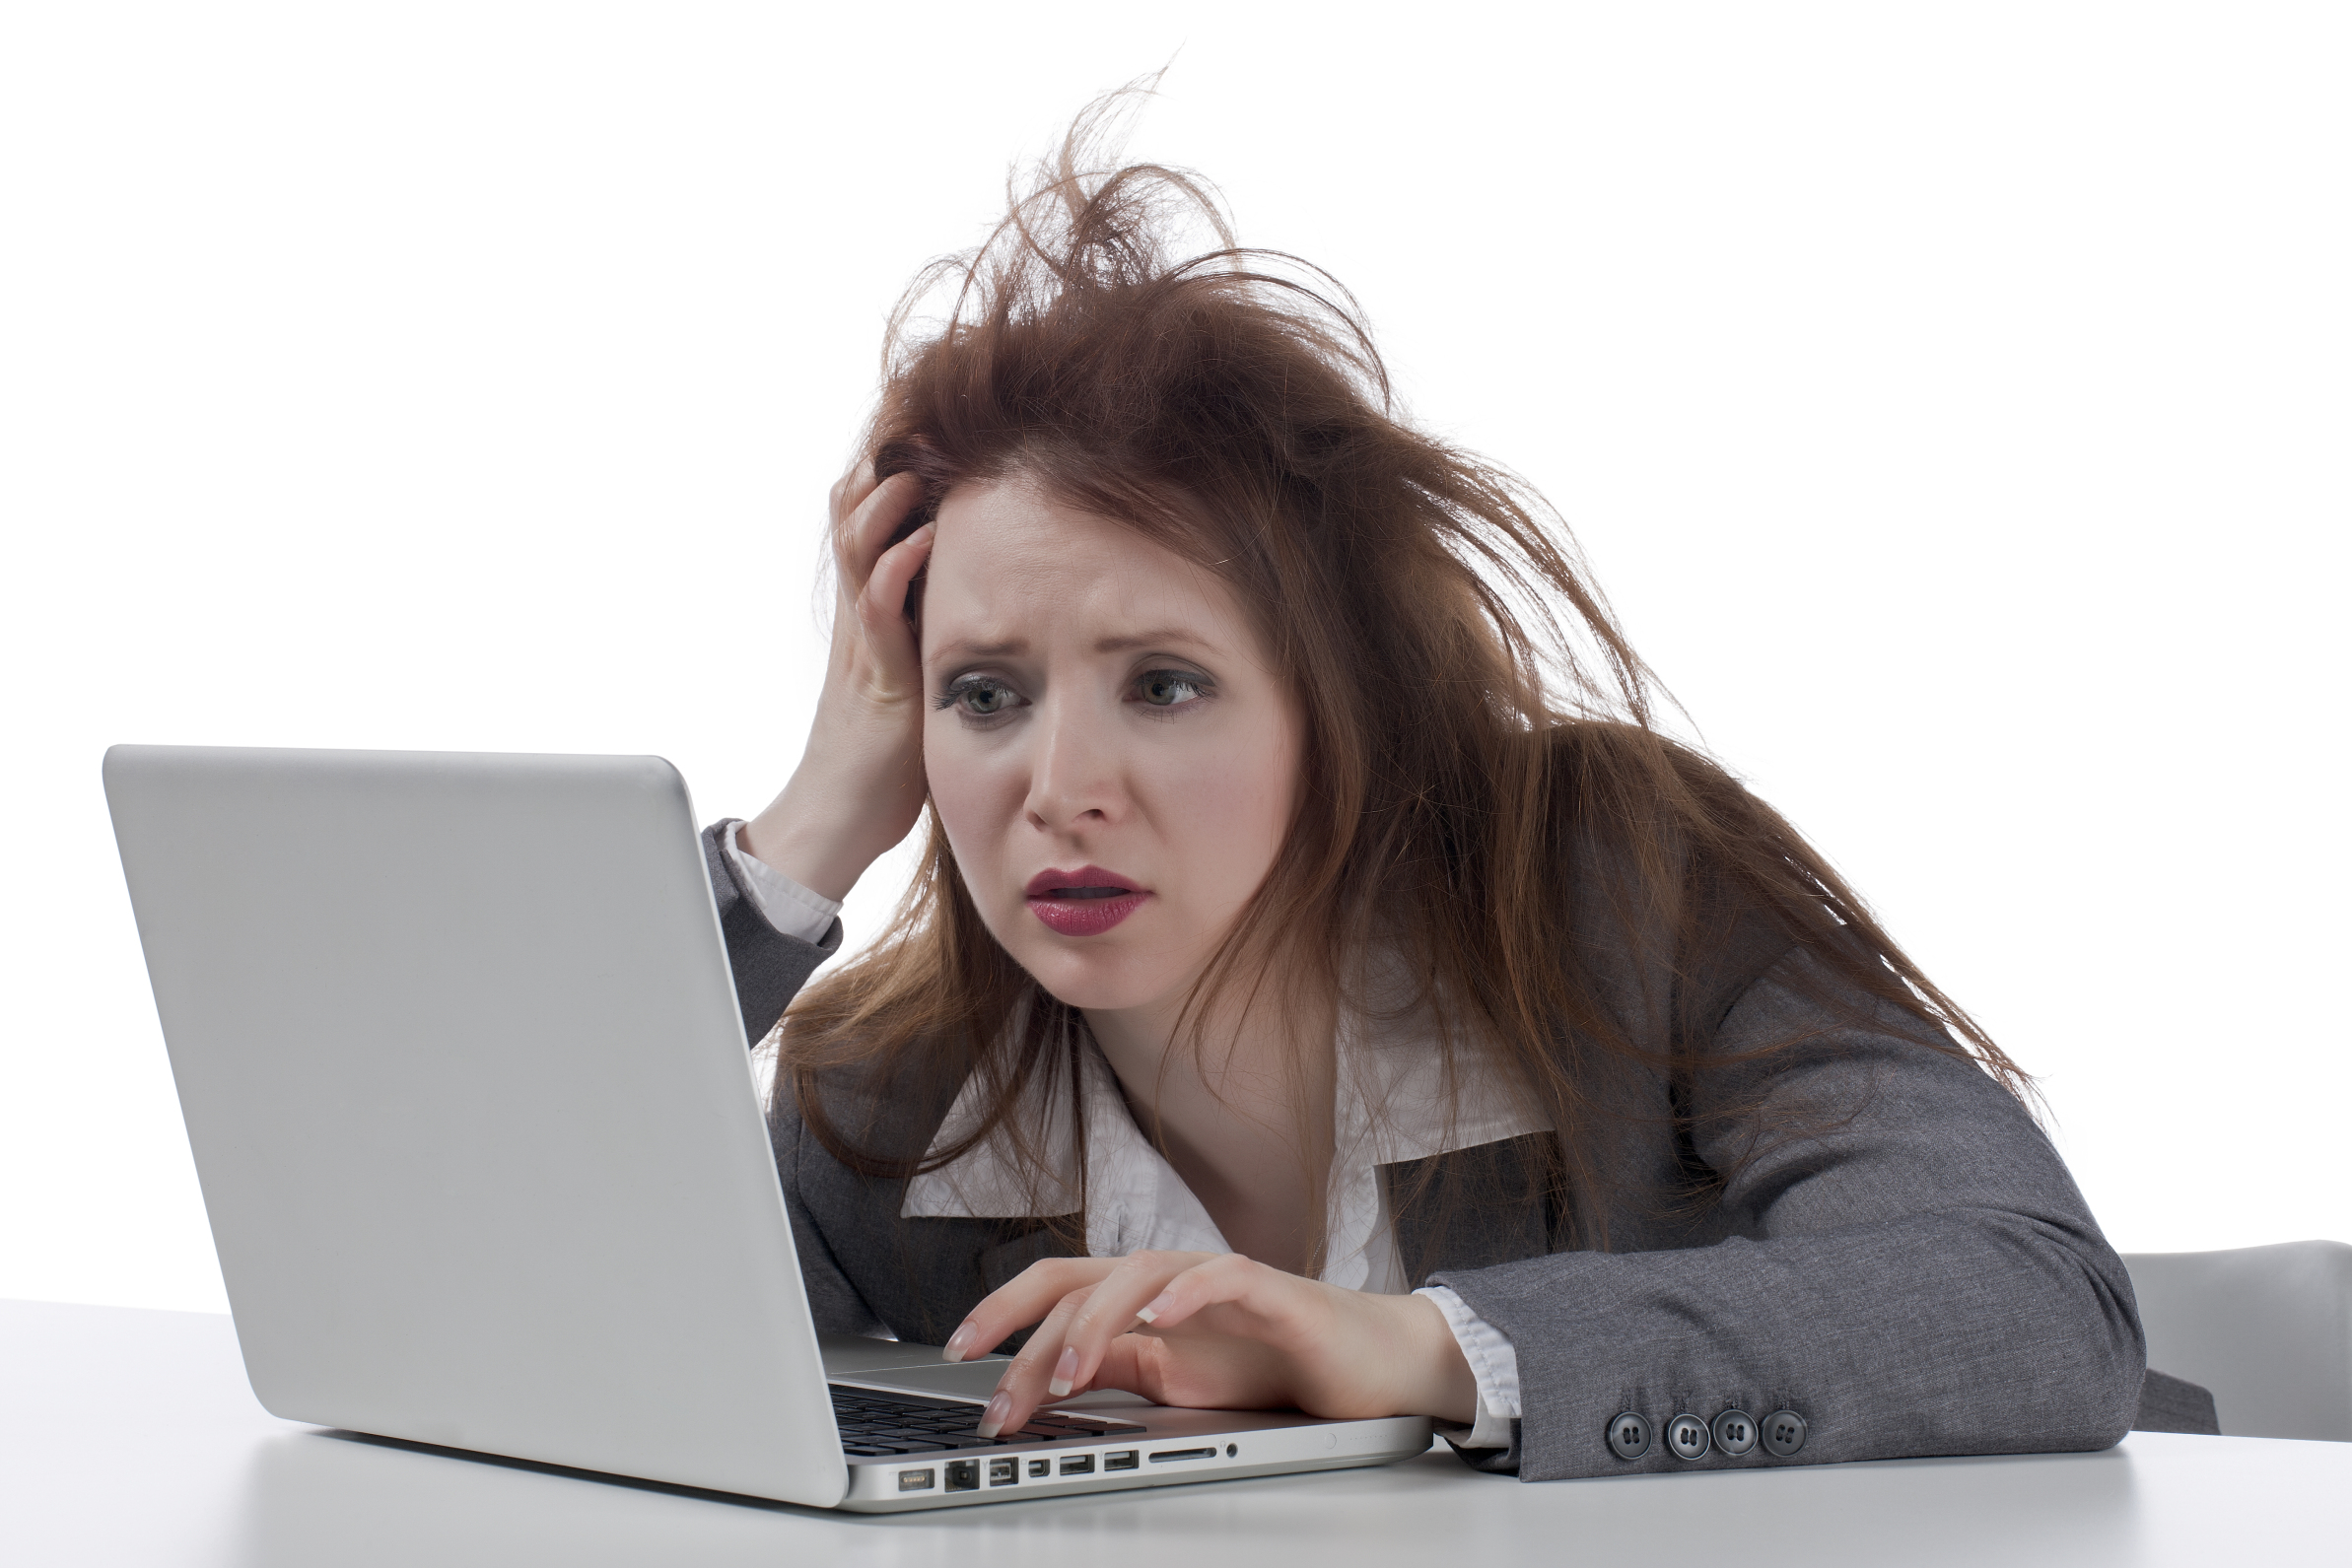 unplugged computer activities